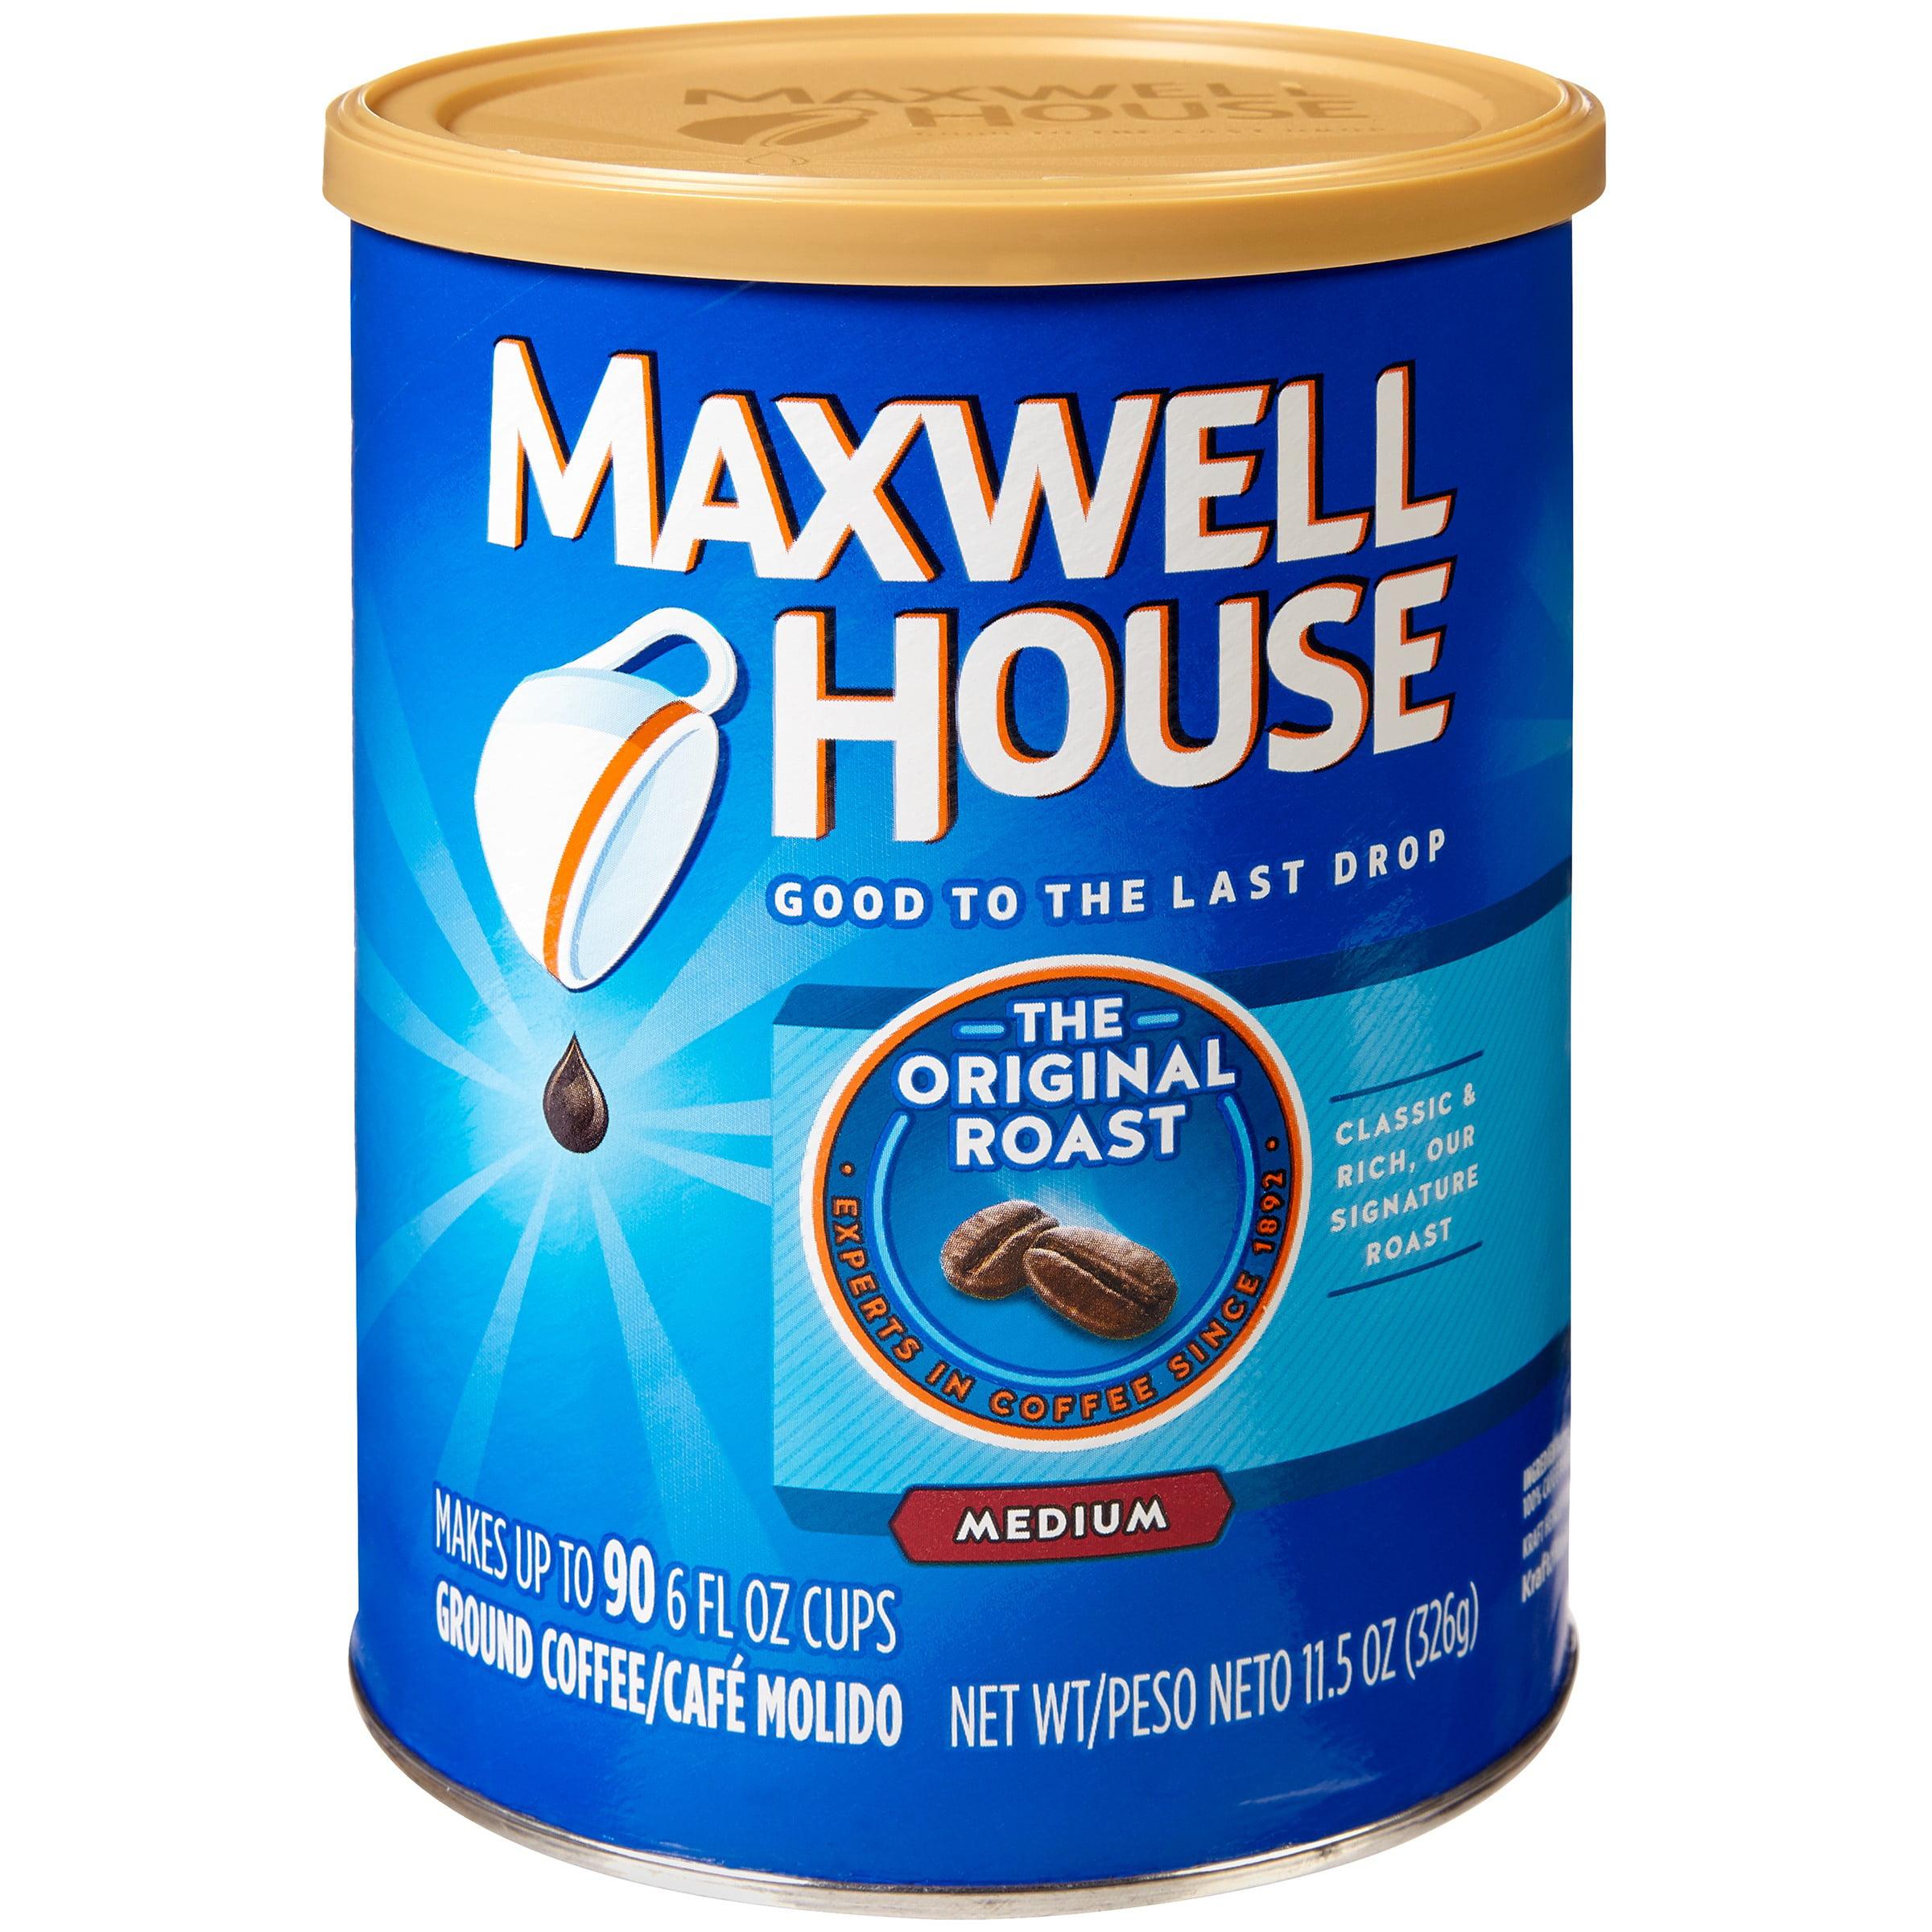 Maxwell House Original Roast Ground Coffee 11.5 oz. Canister